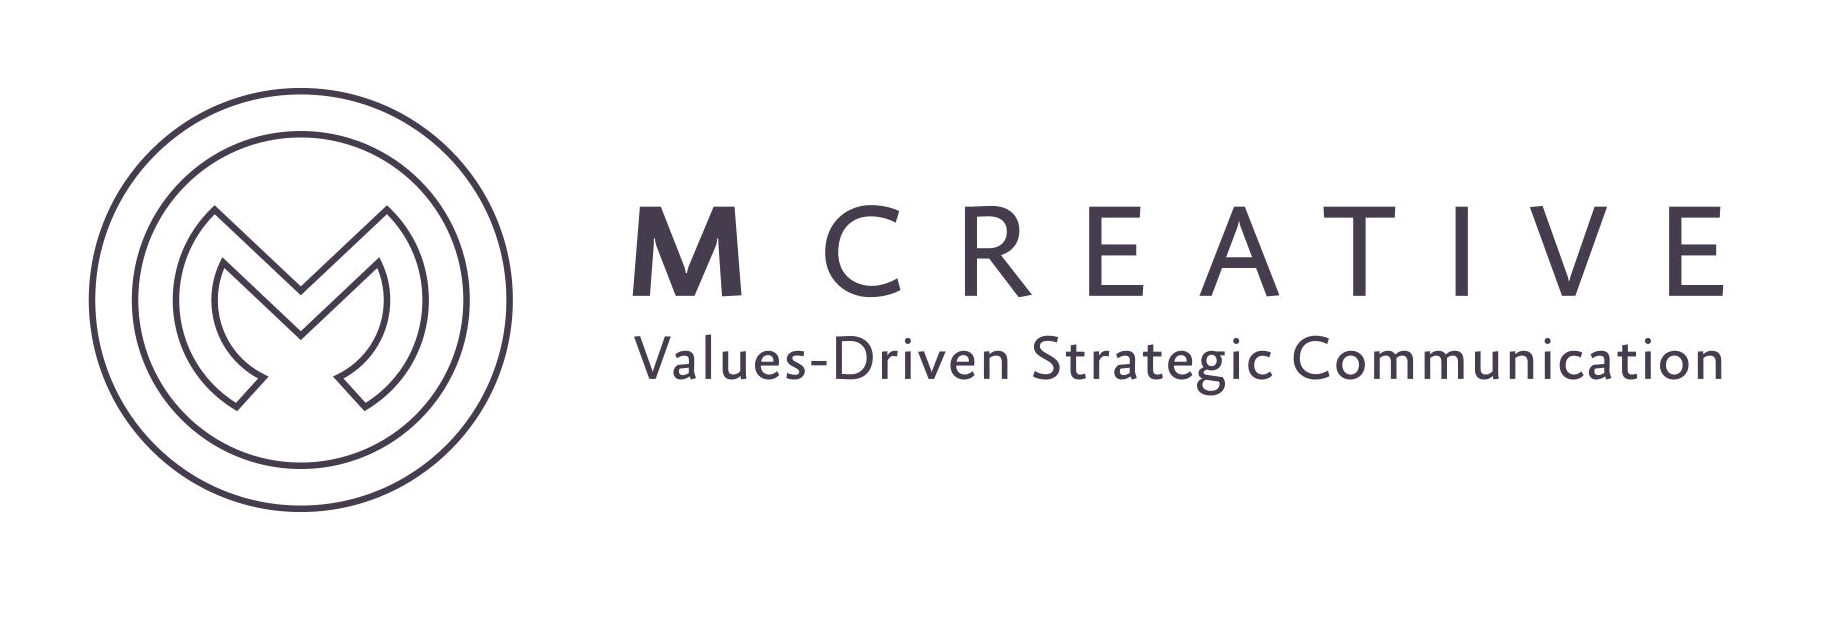 M Creative logo